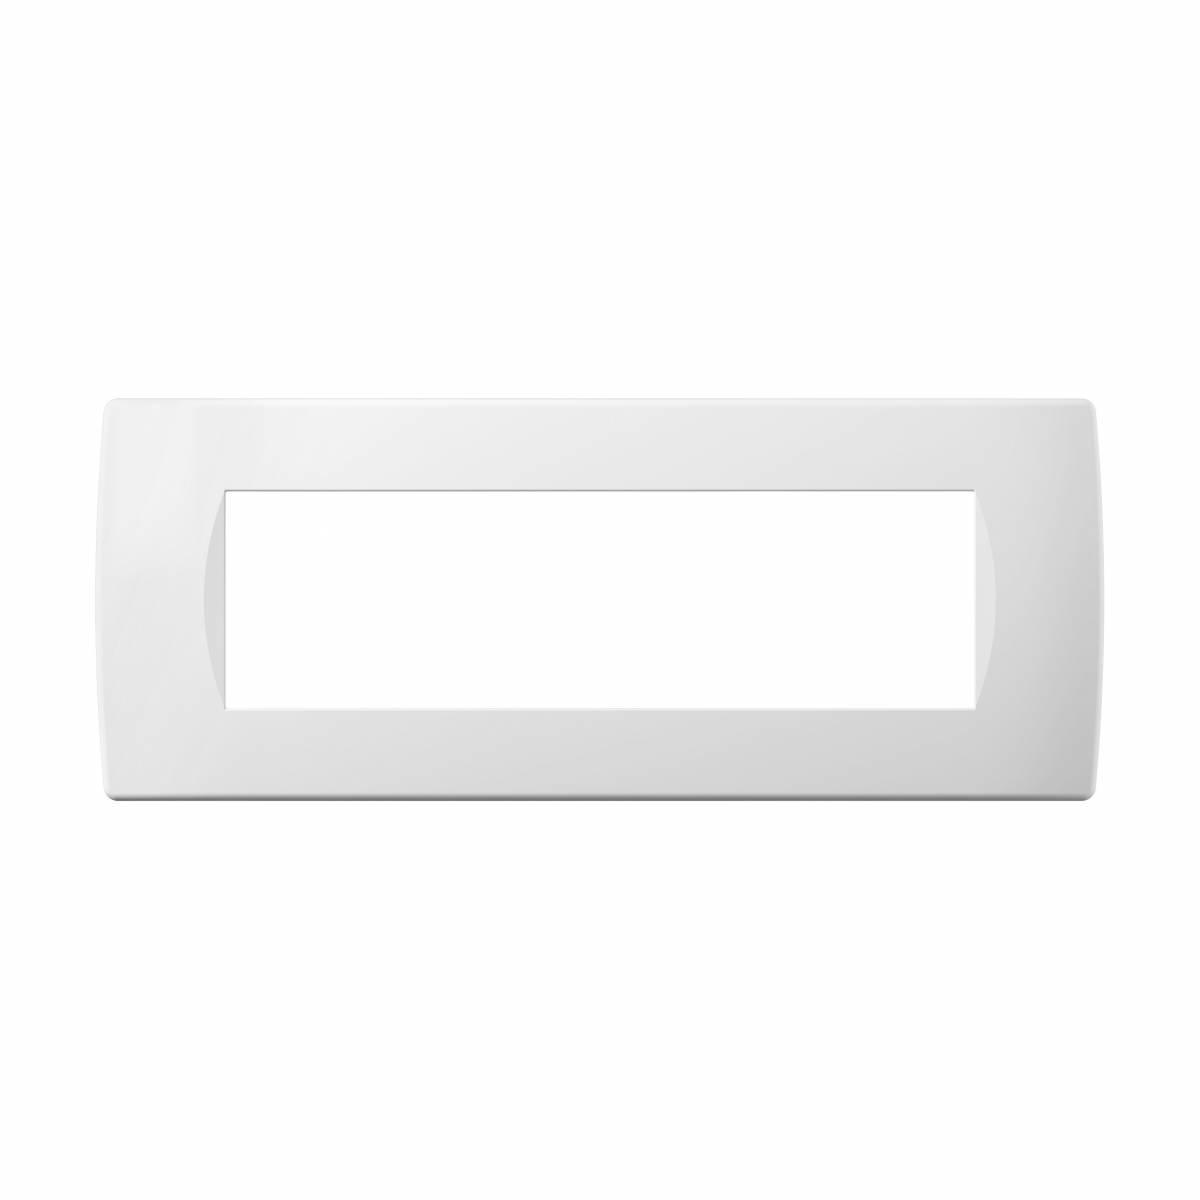 Frame Soft 7M, white